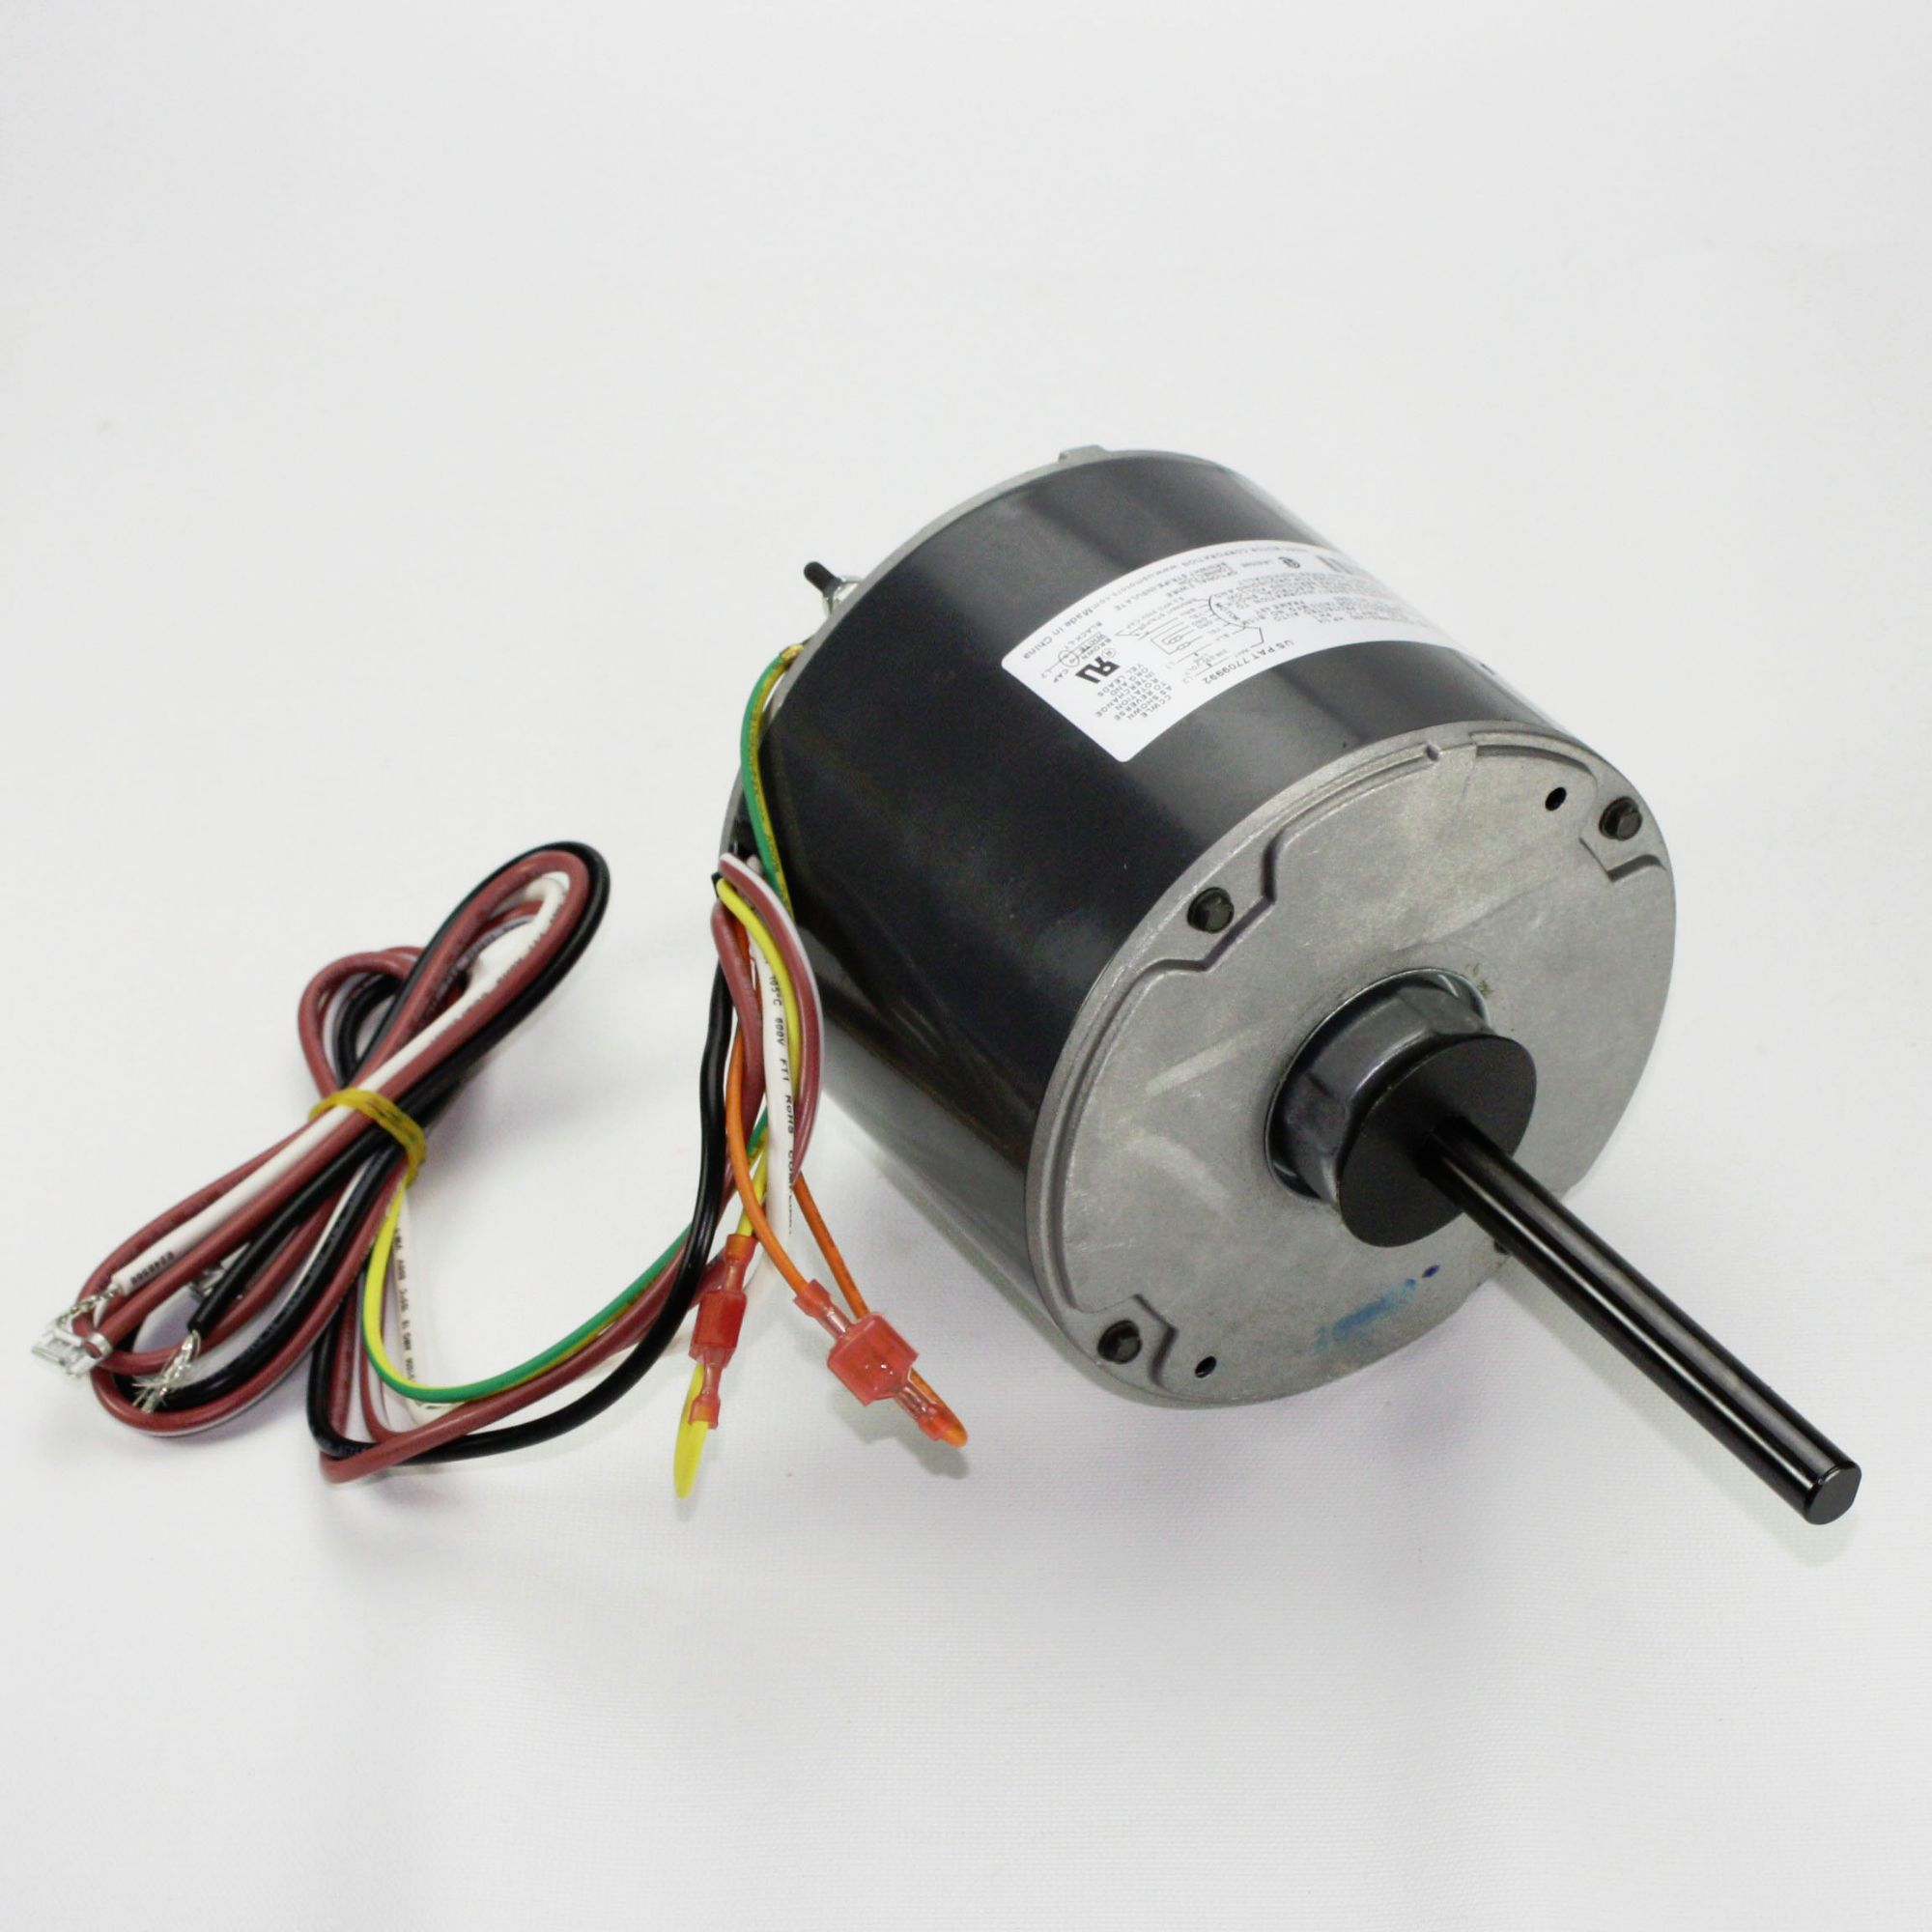 Us Motors 1860 Wiring Diagram Motor Hvac 1 4 Hp Condenser Ebay Rh Com Ac Electric